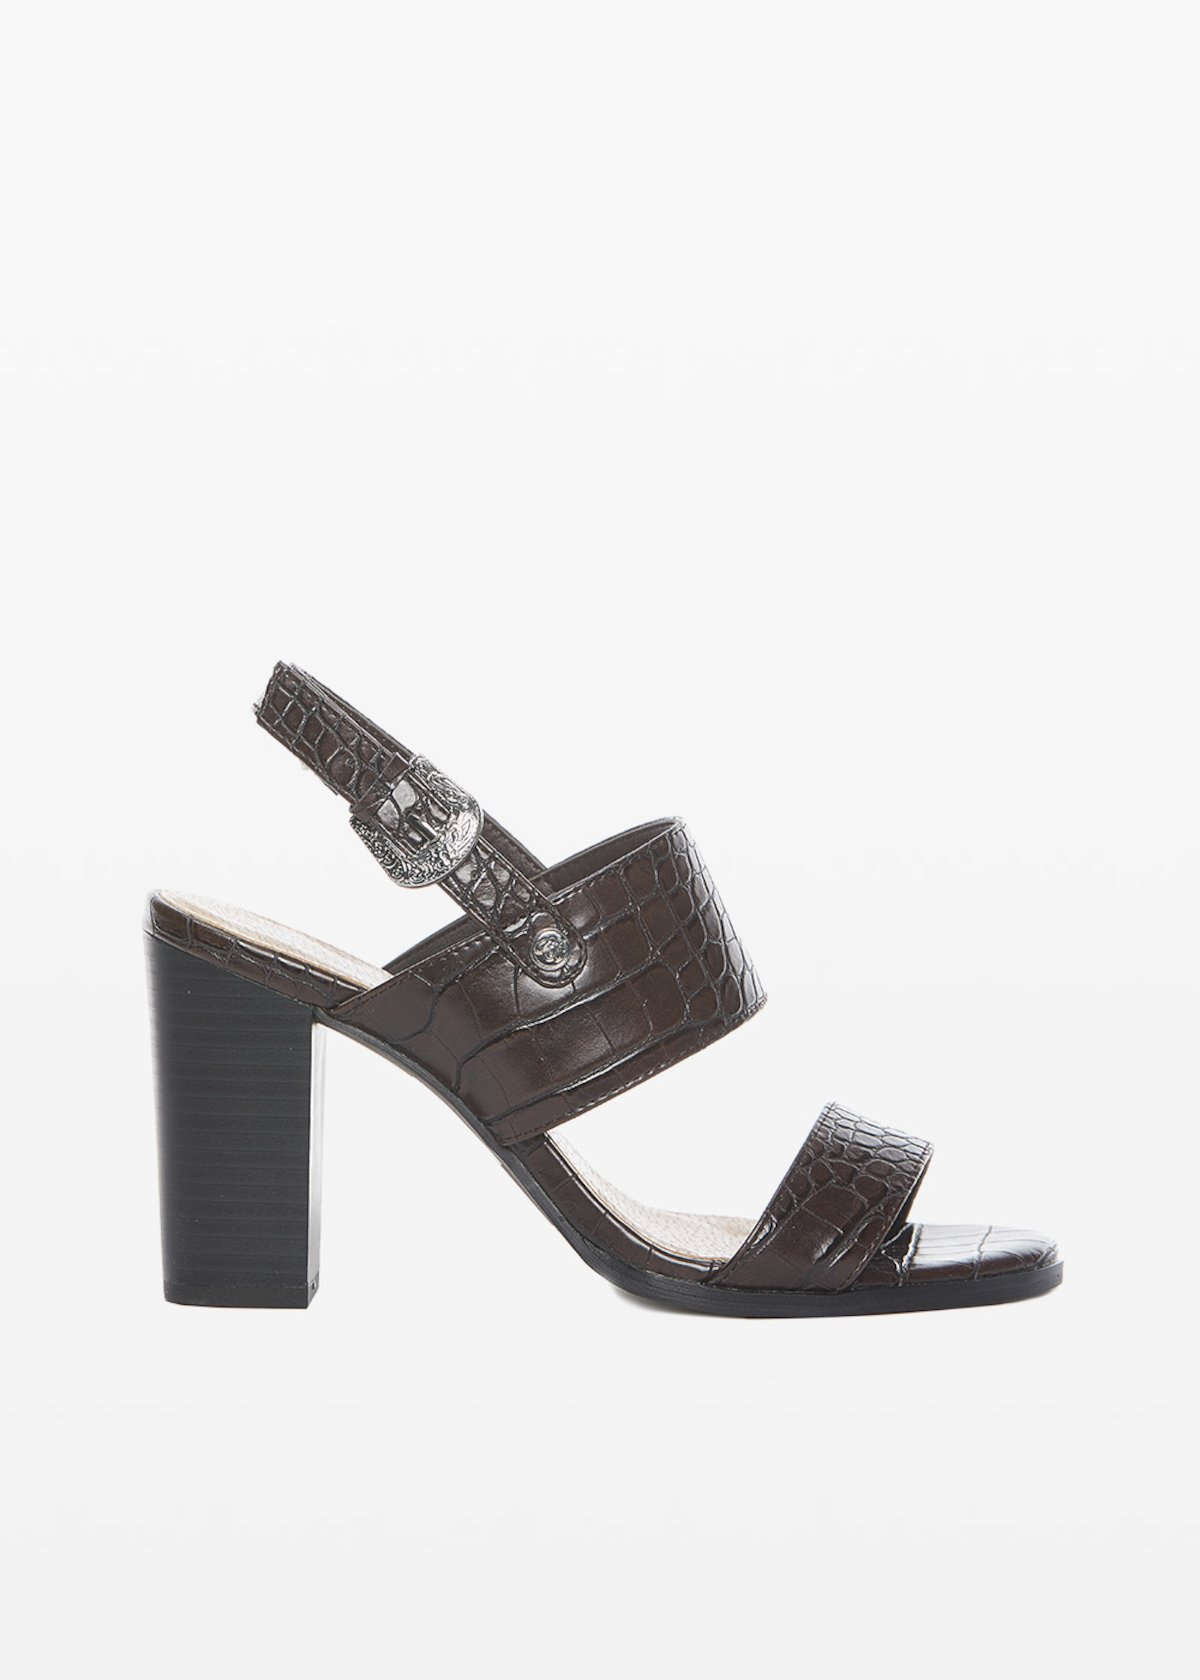 Sael sandals crocodile effect - Crosta - Woman - Category image